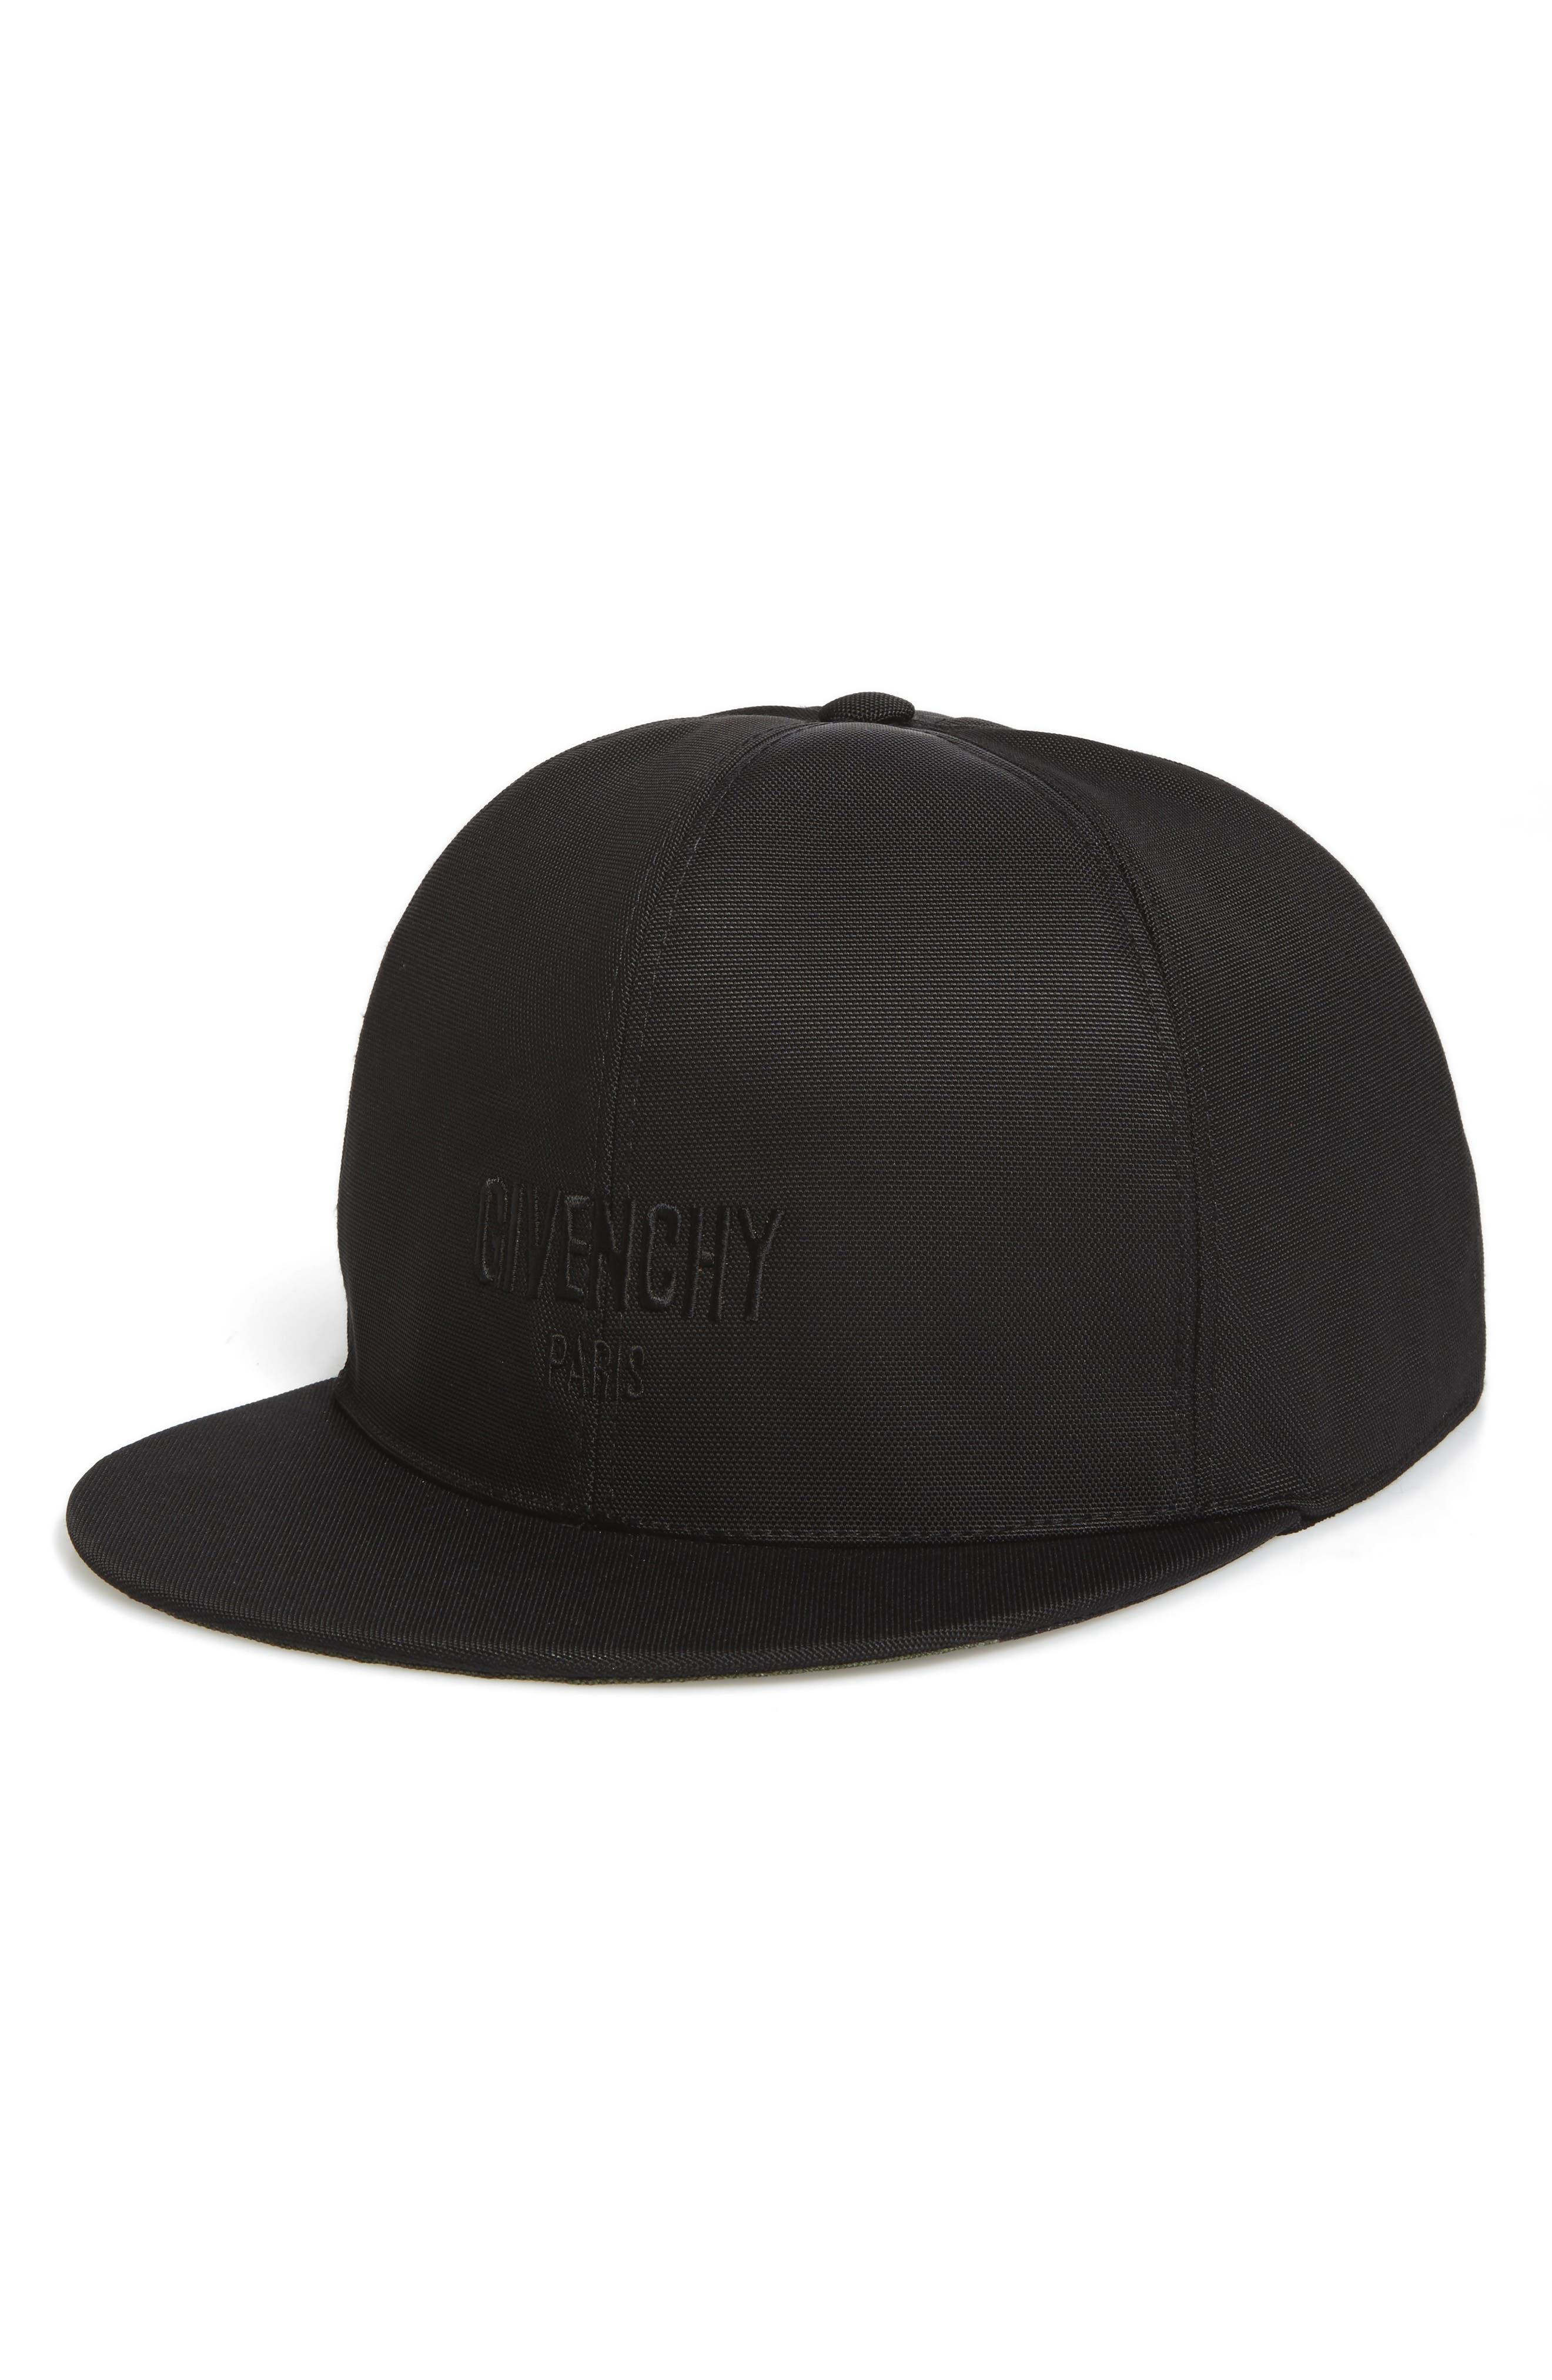 Givenchy Embroidered Baseball Cap